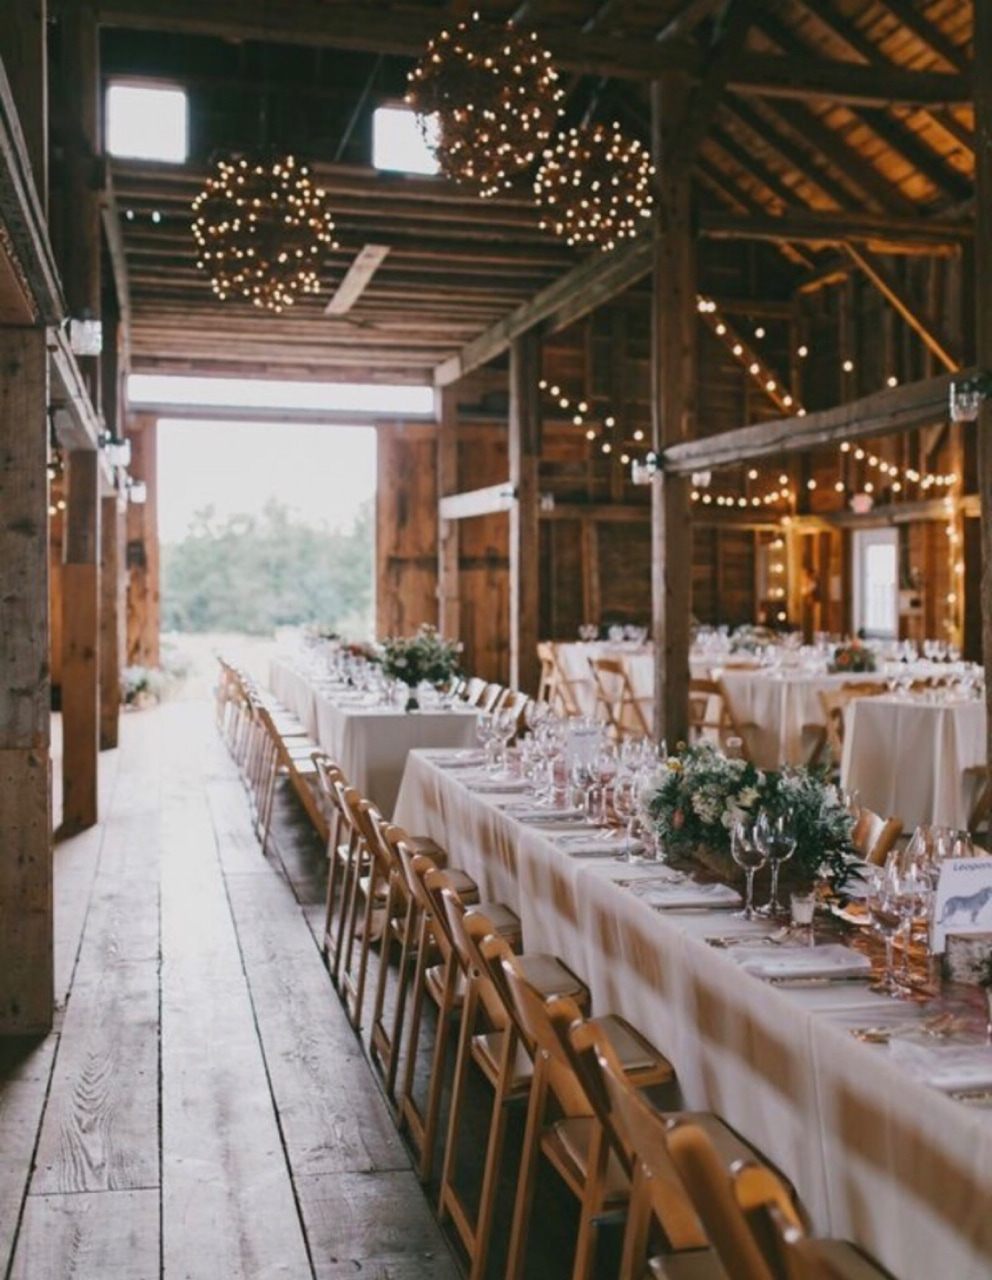 wedding and lights image